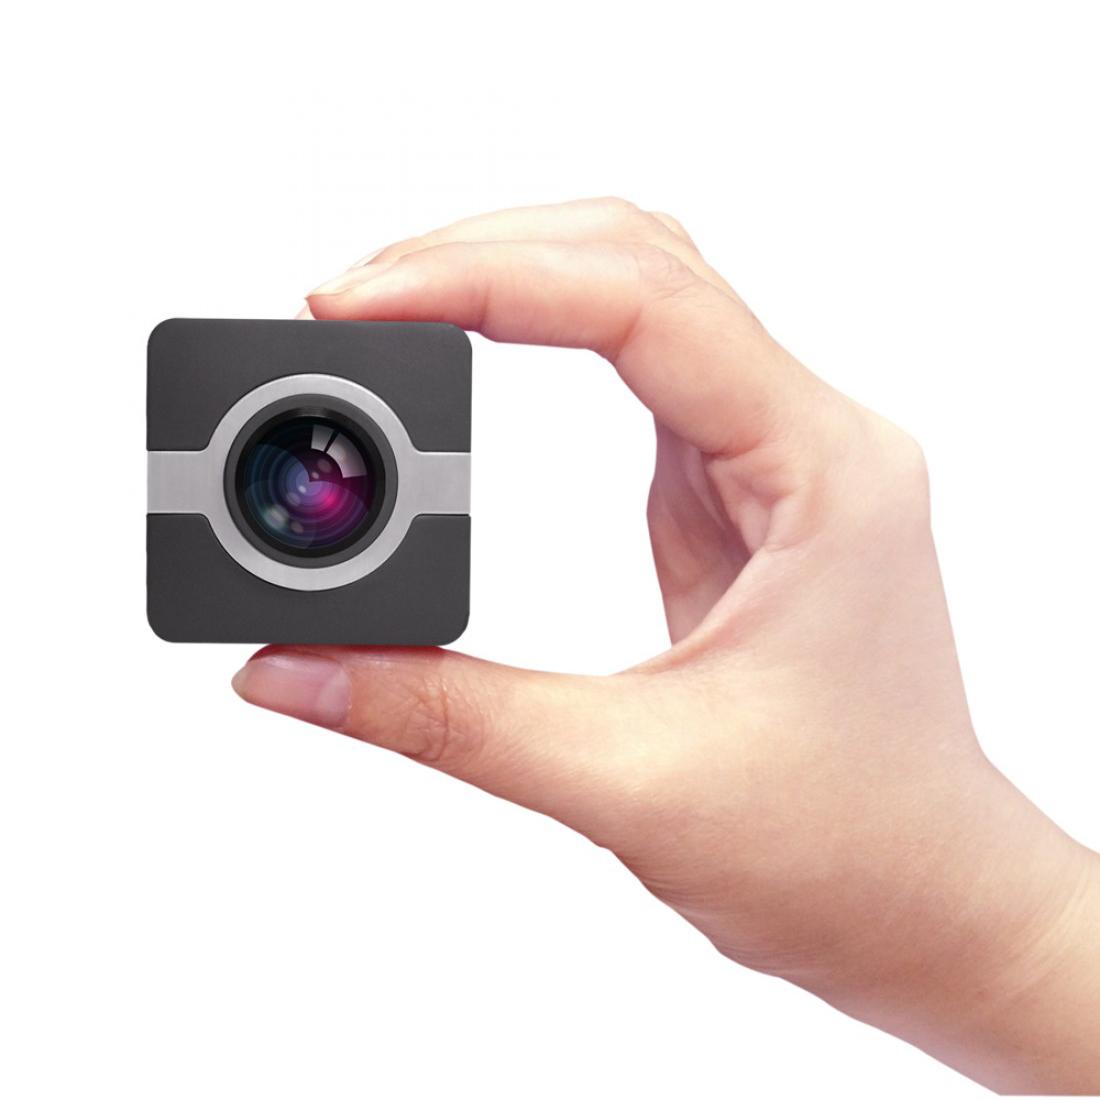 Matecam X1 Car Dashboard Camera Cam recorder WIFI Sports Action Camera 4K-HI Ultra HD Waterproof DV Camcorder 16MP 160 Degree Wide Angle WIFIG-SensorGyro StabilizationMotion DetectionRemote control RC cam Bike Helmet Cam  (